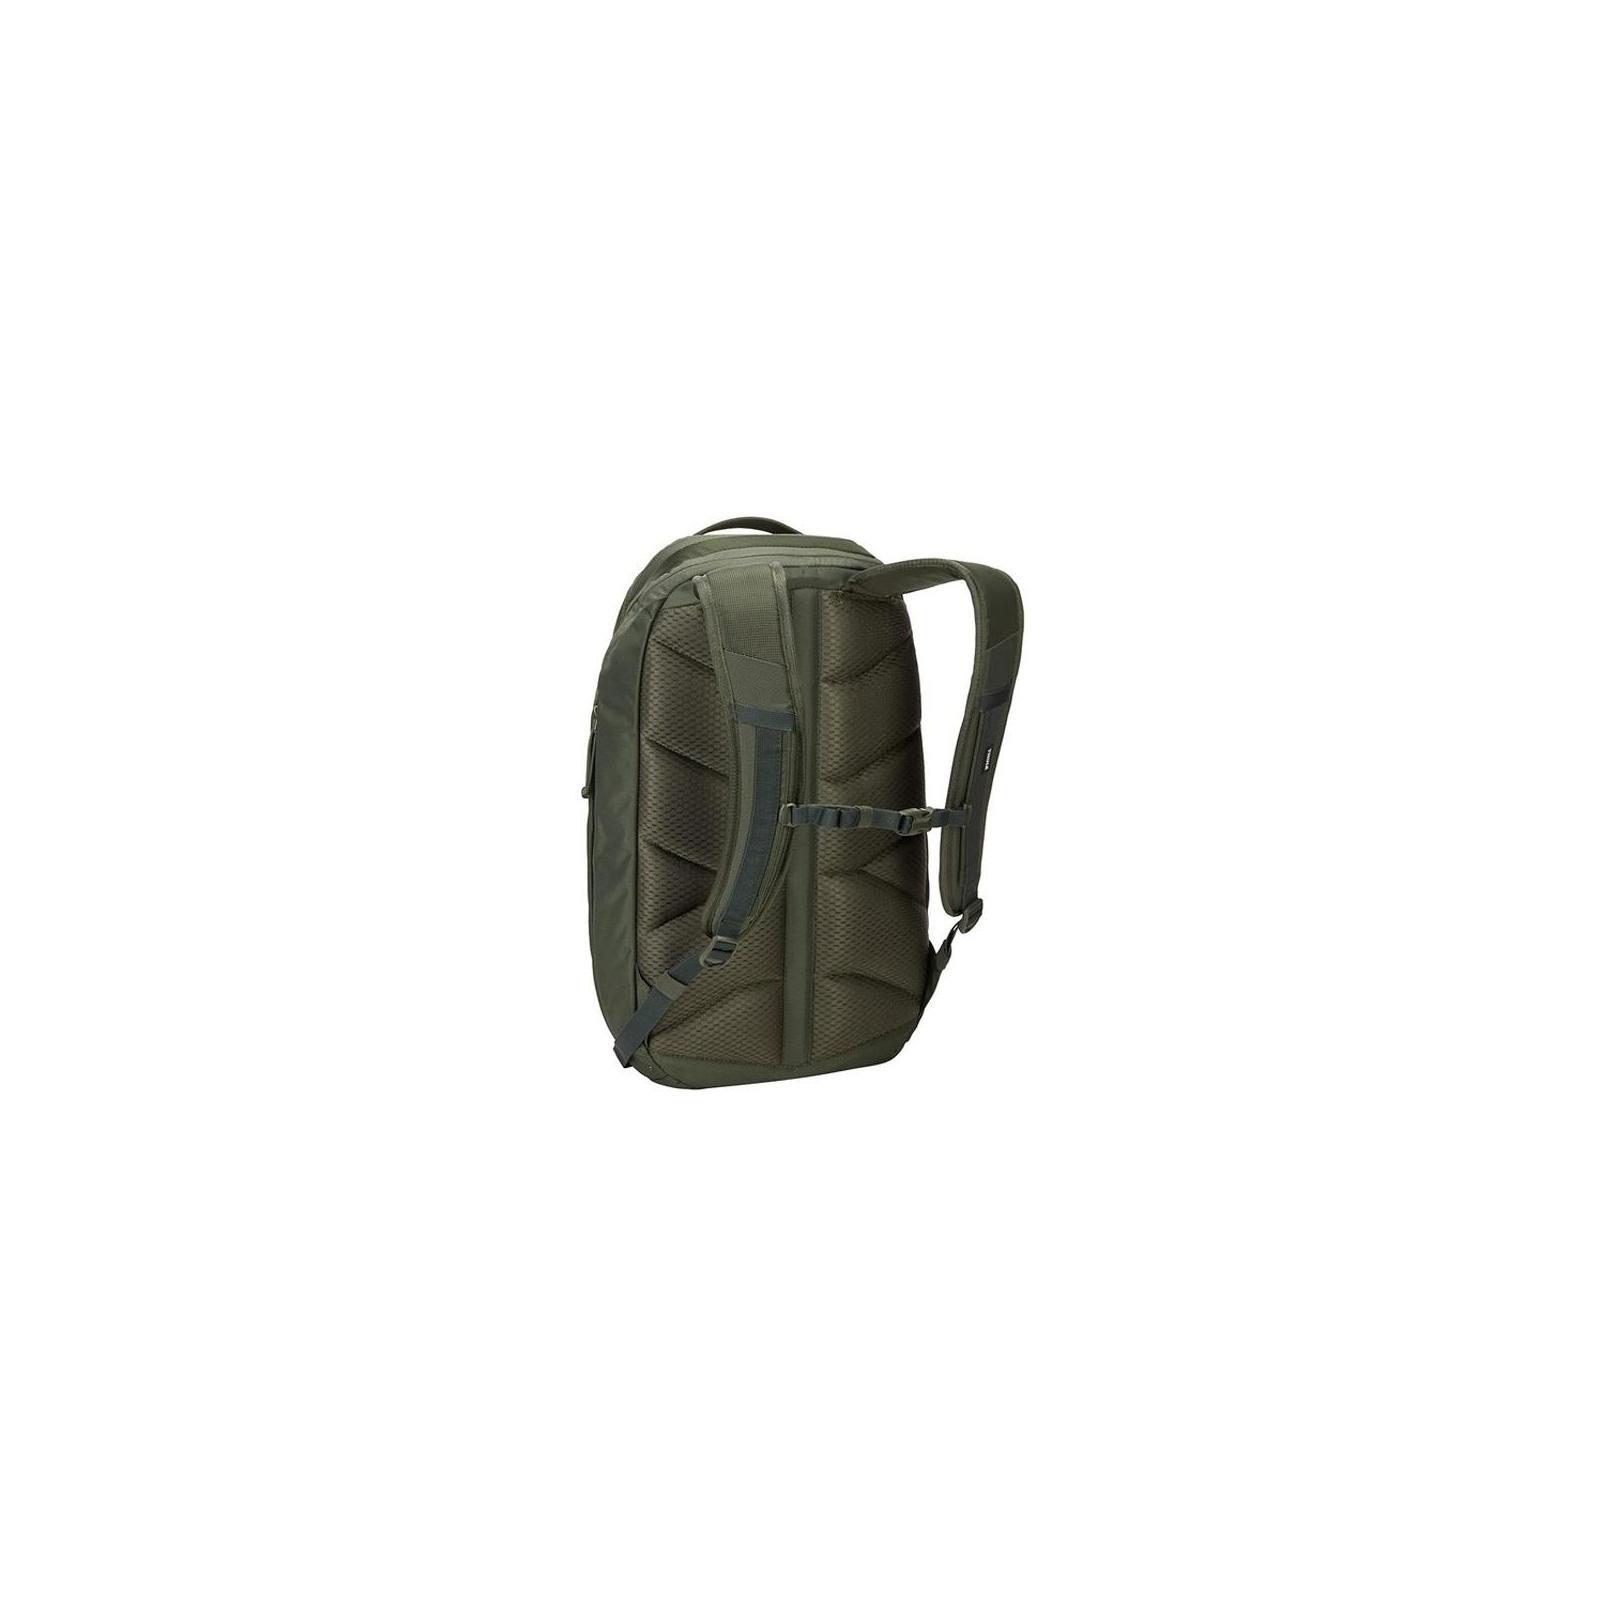 "Рюкзак для ноутбука Thule 15.6"" EnRoute 23L TEBP-316 Asphalt (3203830) изображение 3"